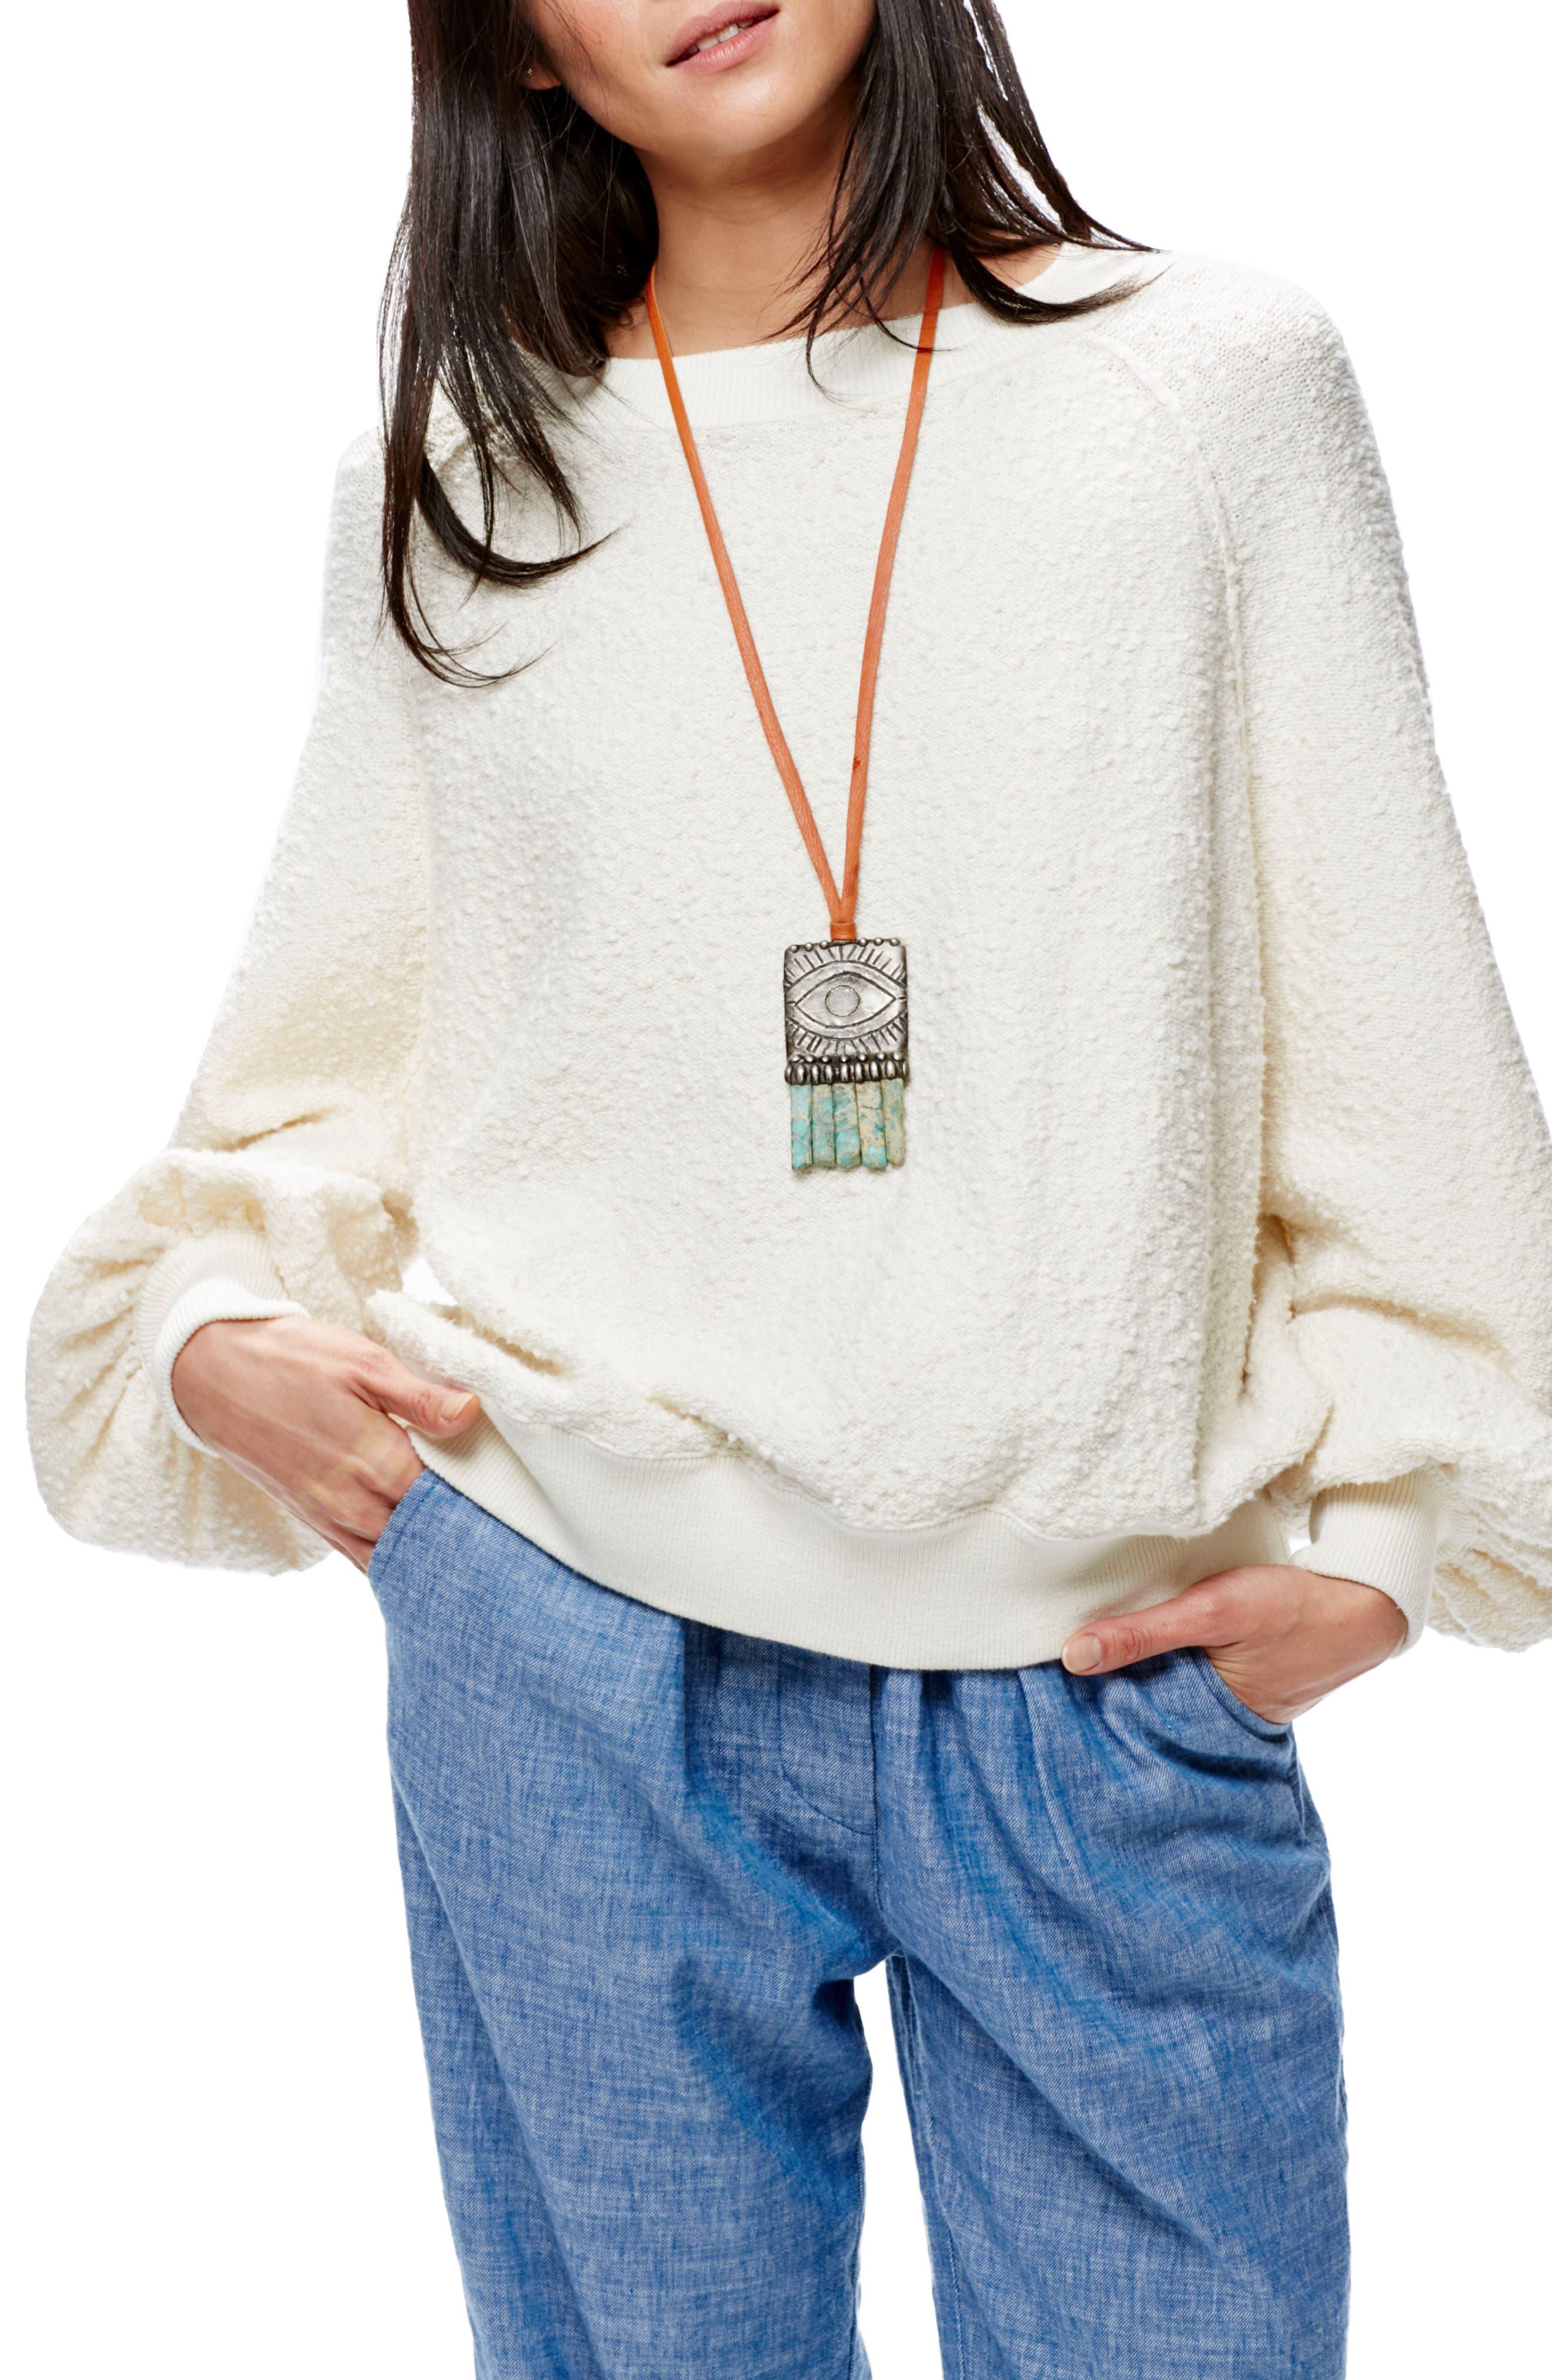 Free People Found My Friend Sweatshirt